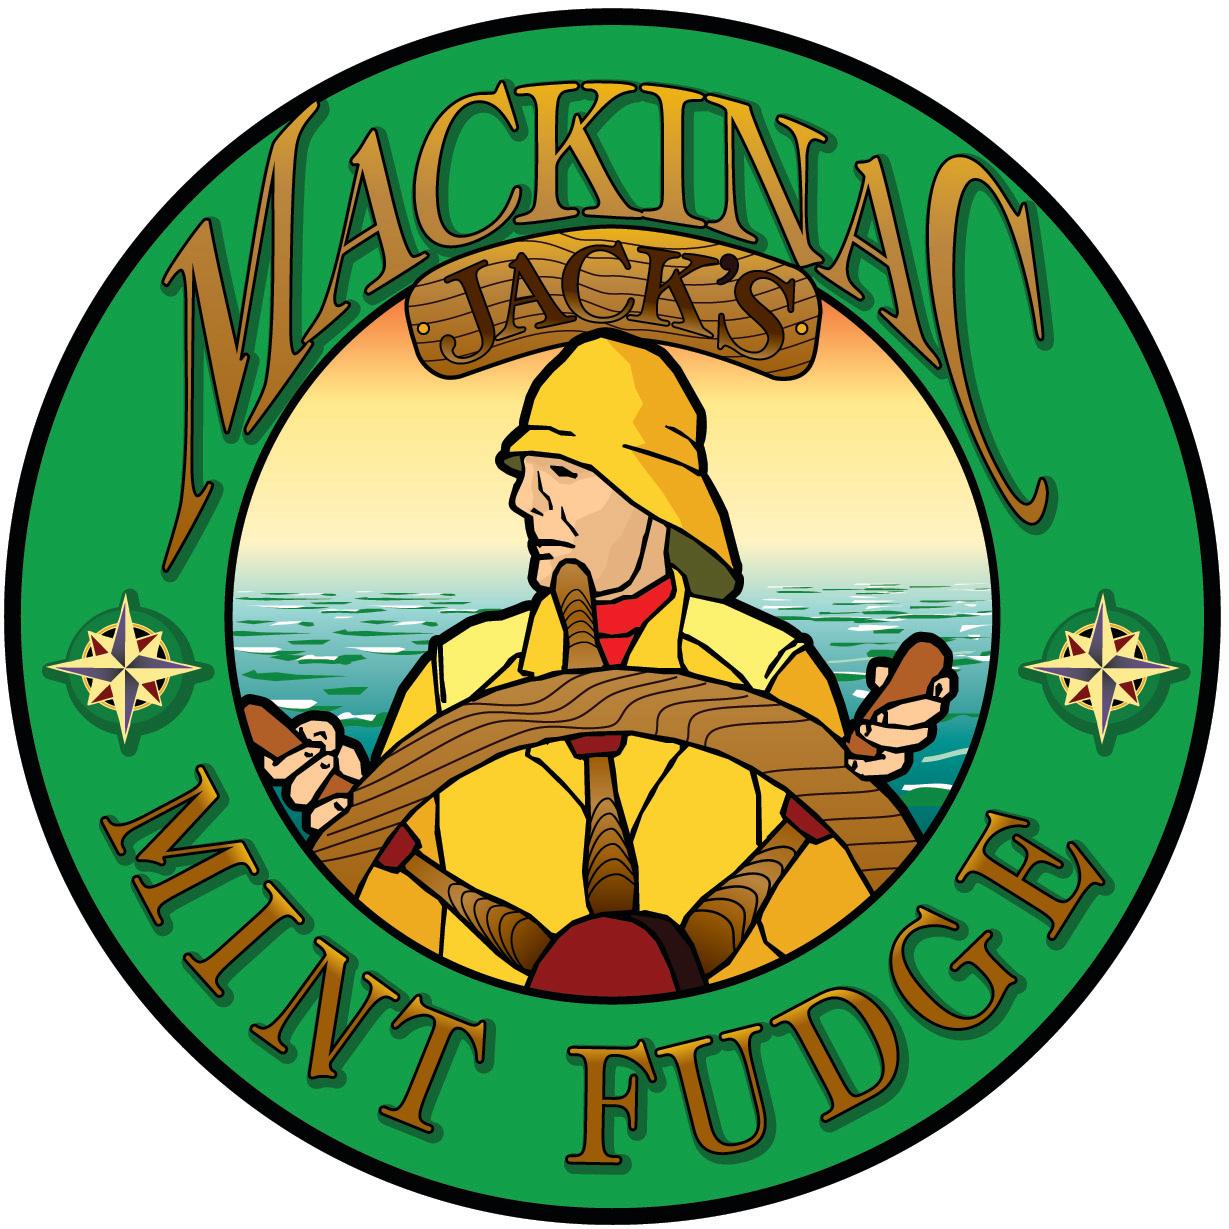 Mack Jack Mint Fudge